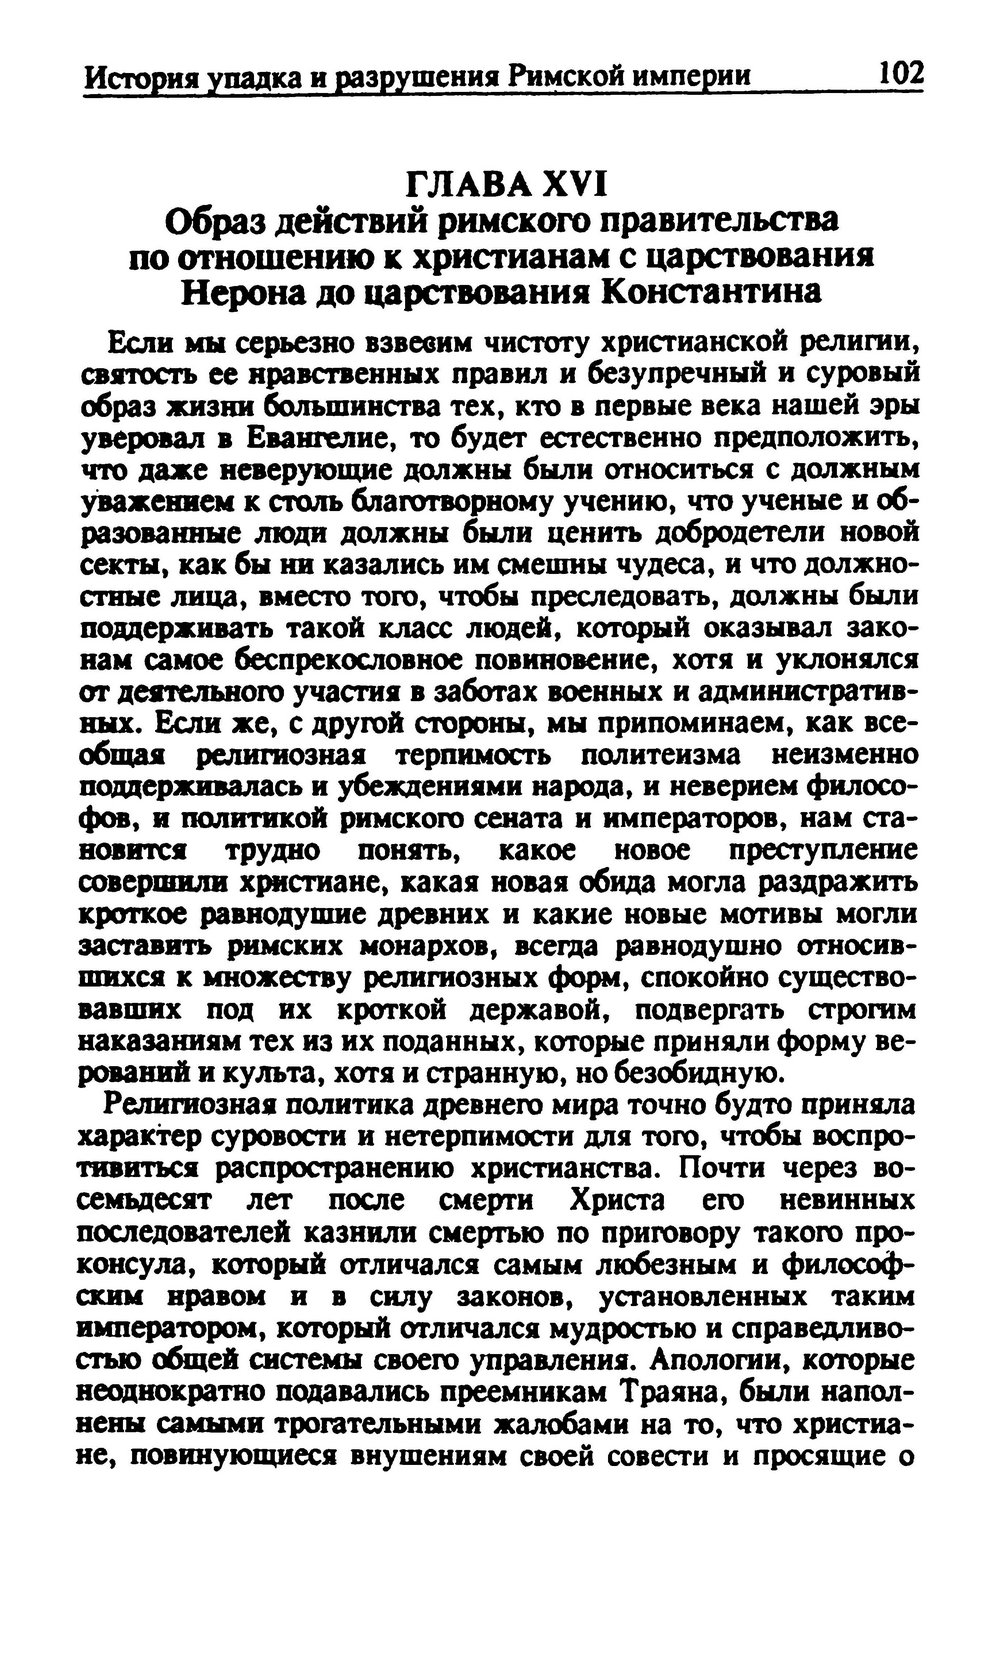 http://images.vfl.ru/ii/1367417378/86635f83/2258636.jpg